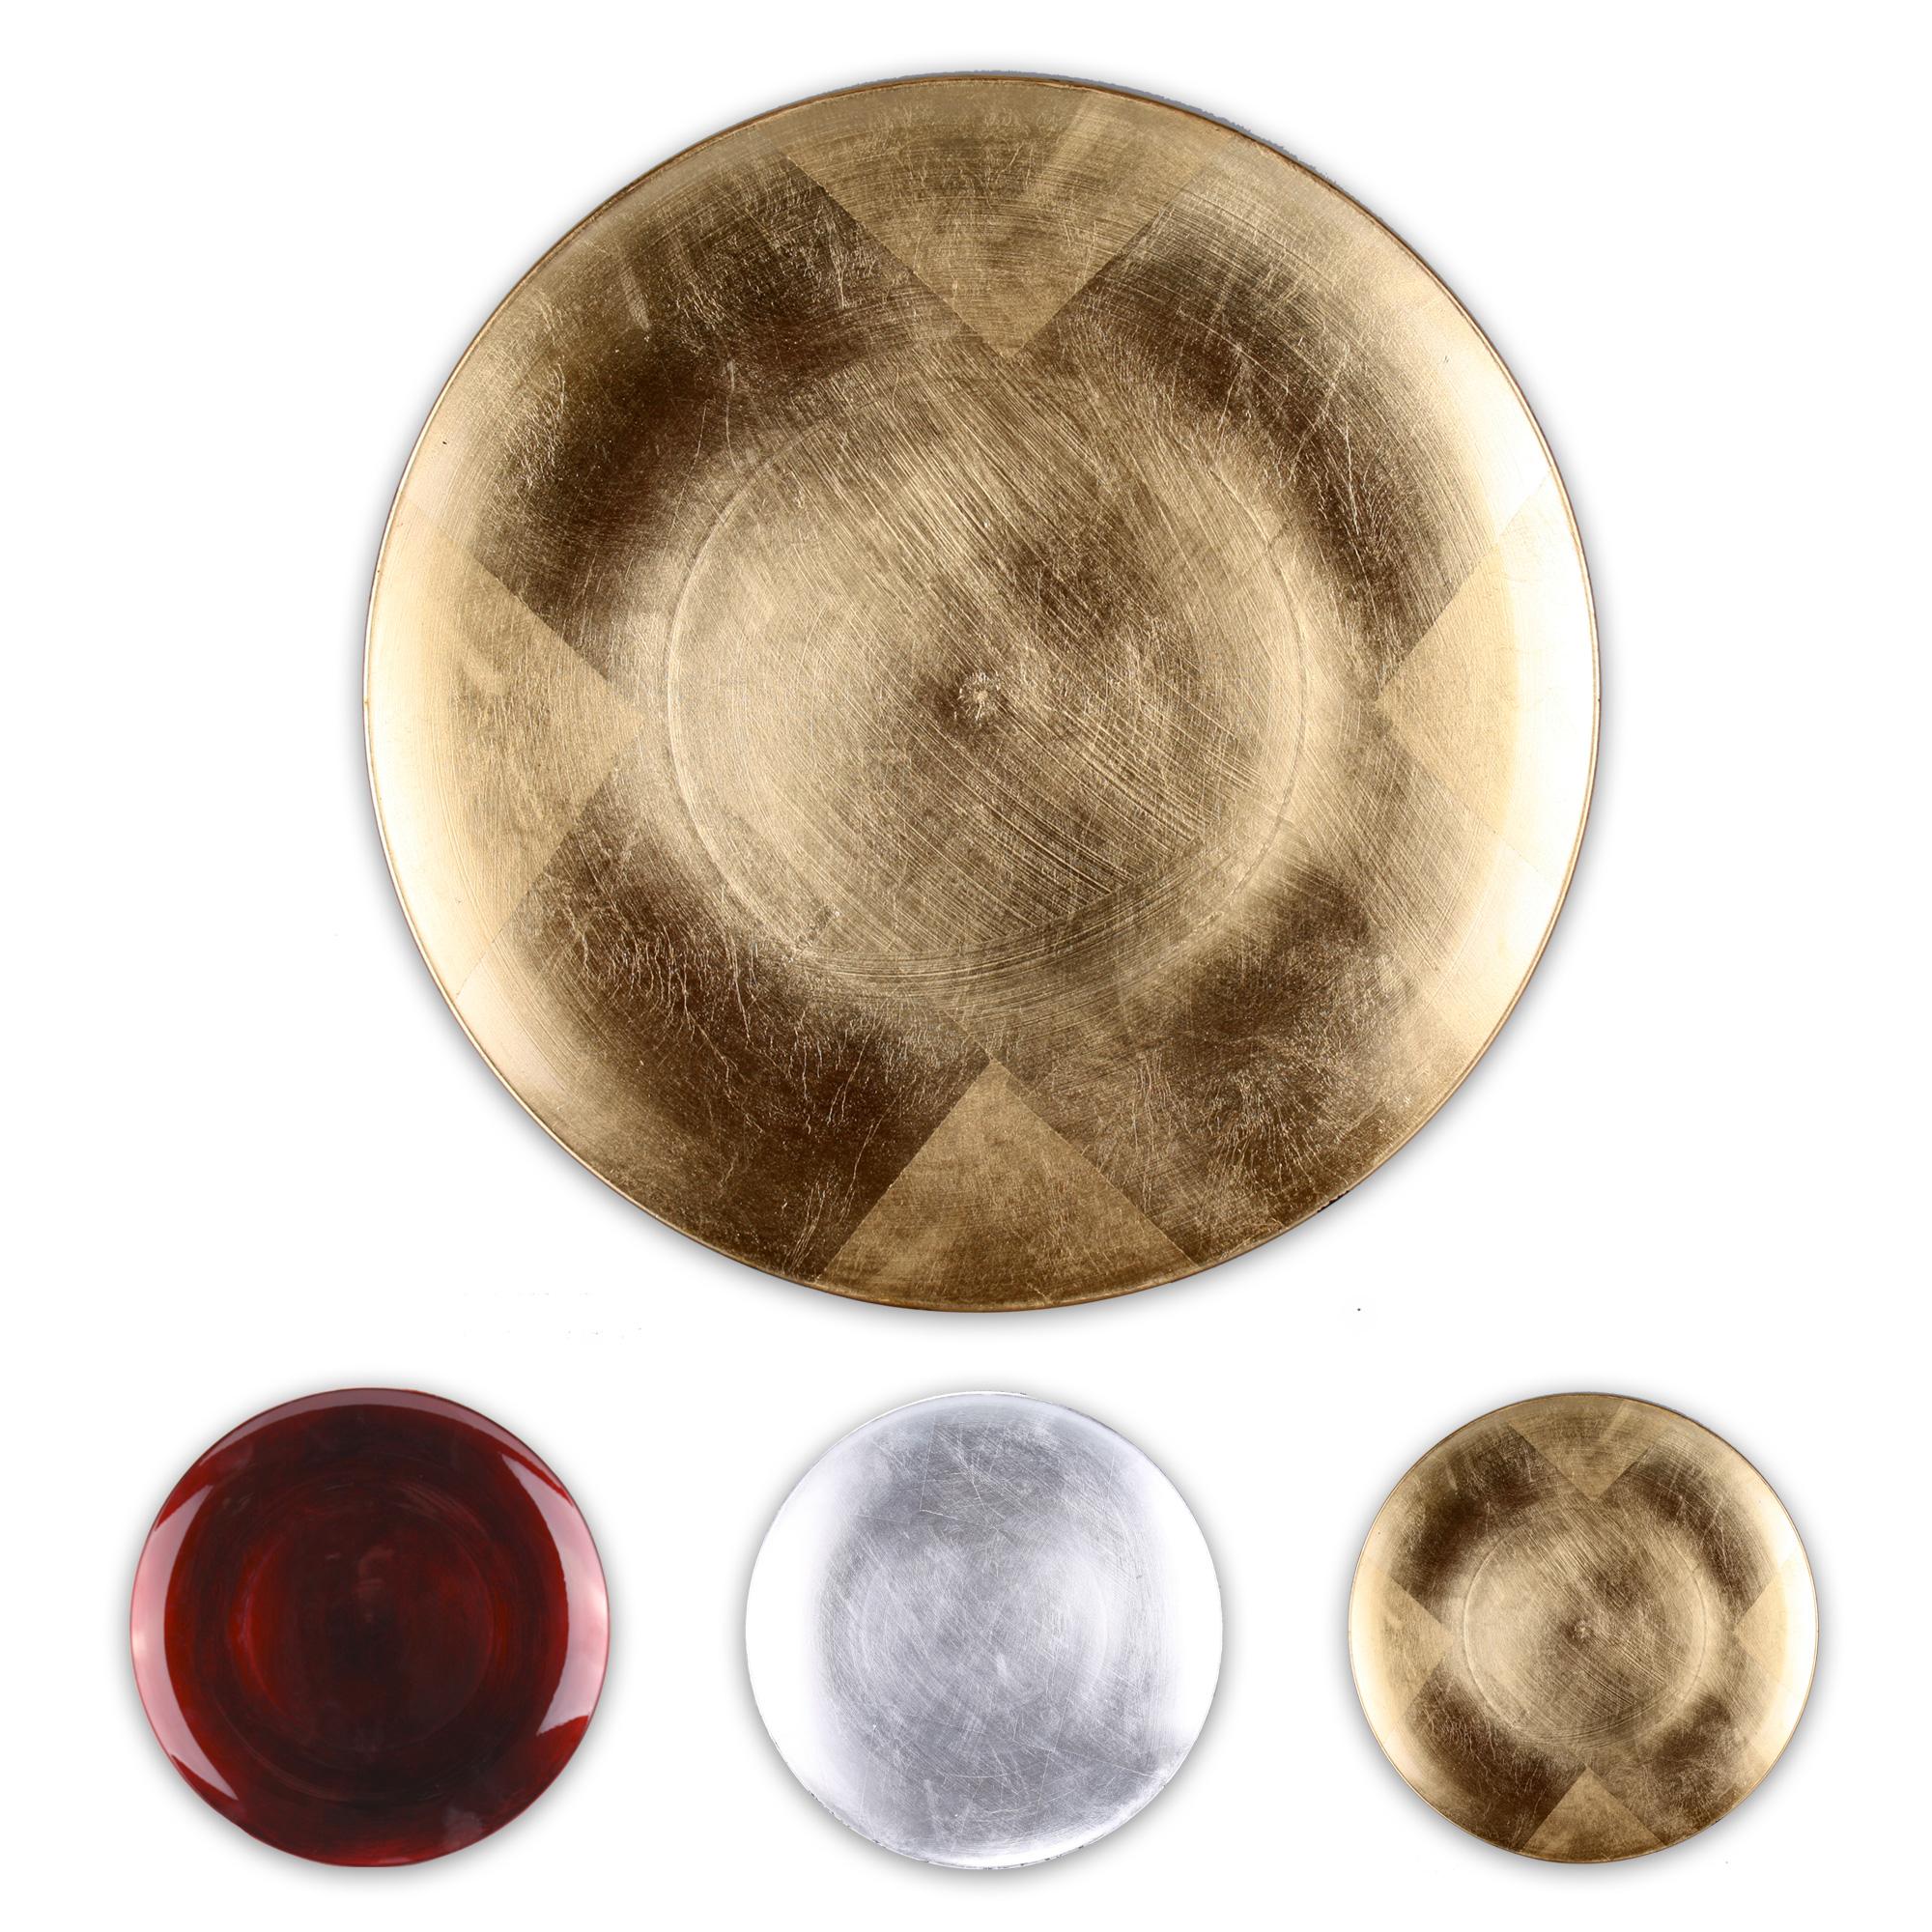 Decorative plate 28 cm melamine fruit plate plate plastic plate red gold silver ebay - Dekoteller gold ...